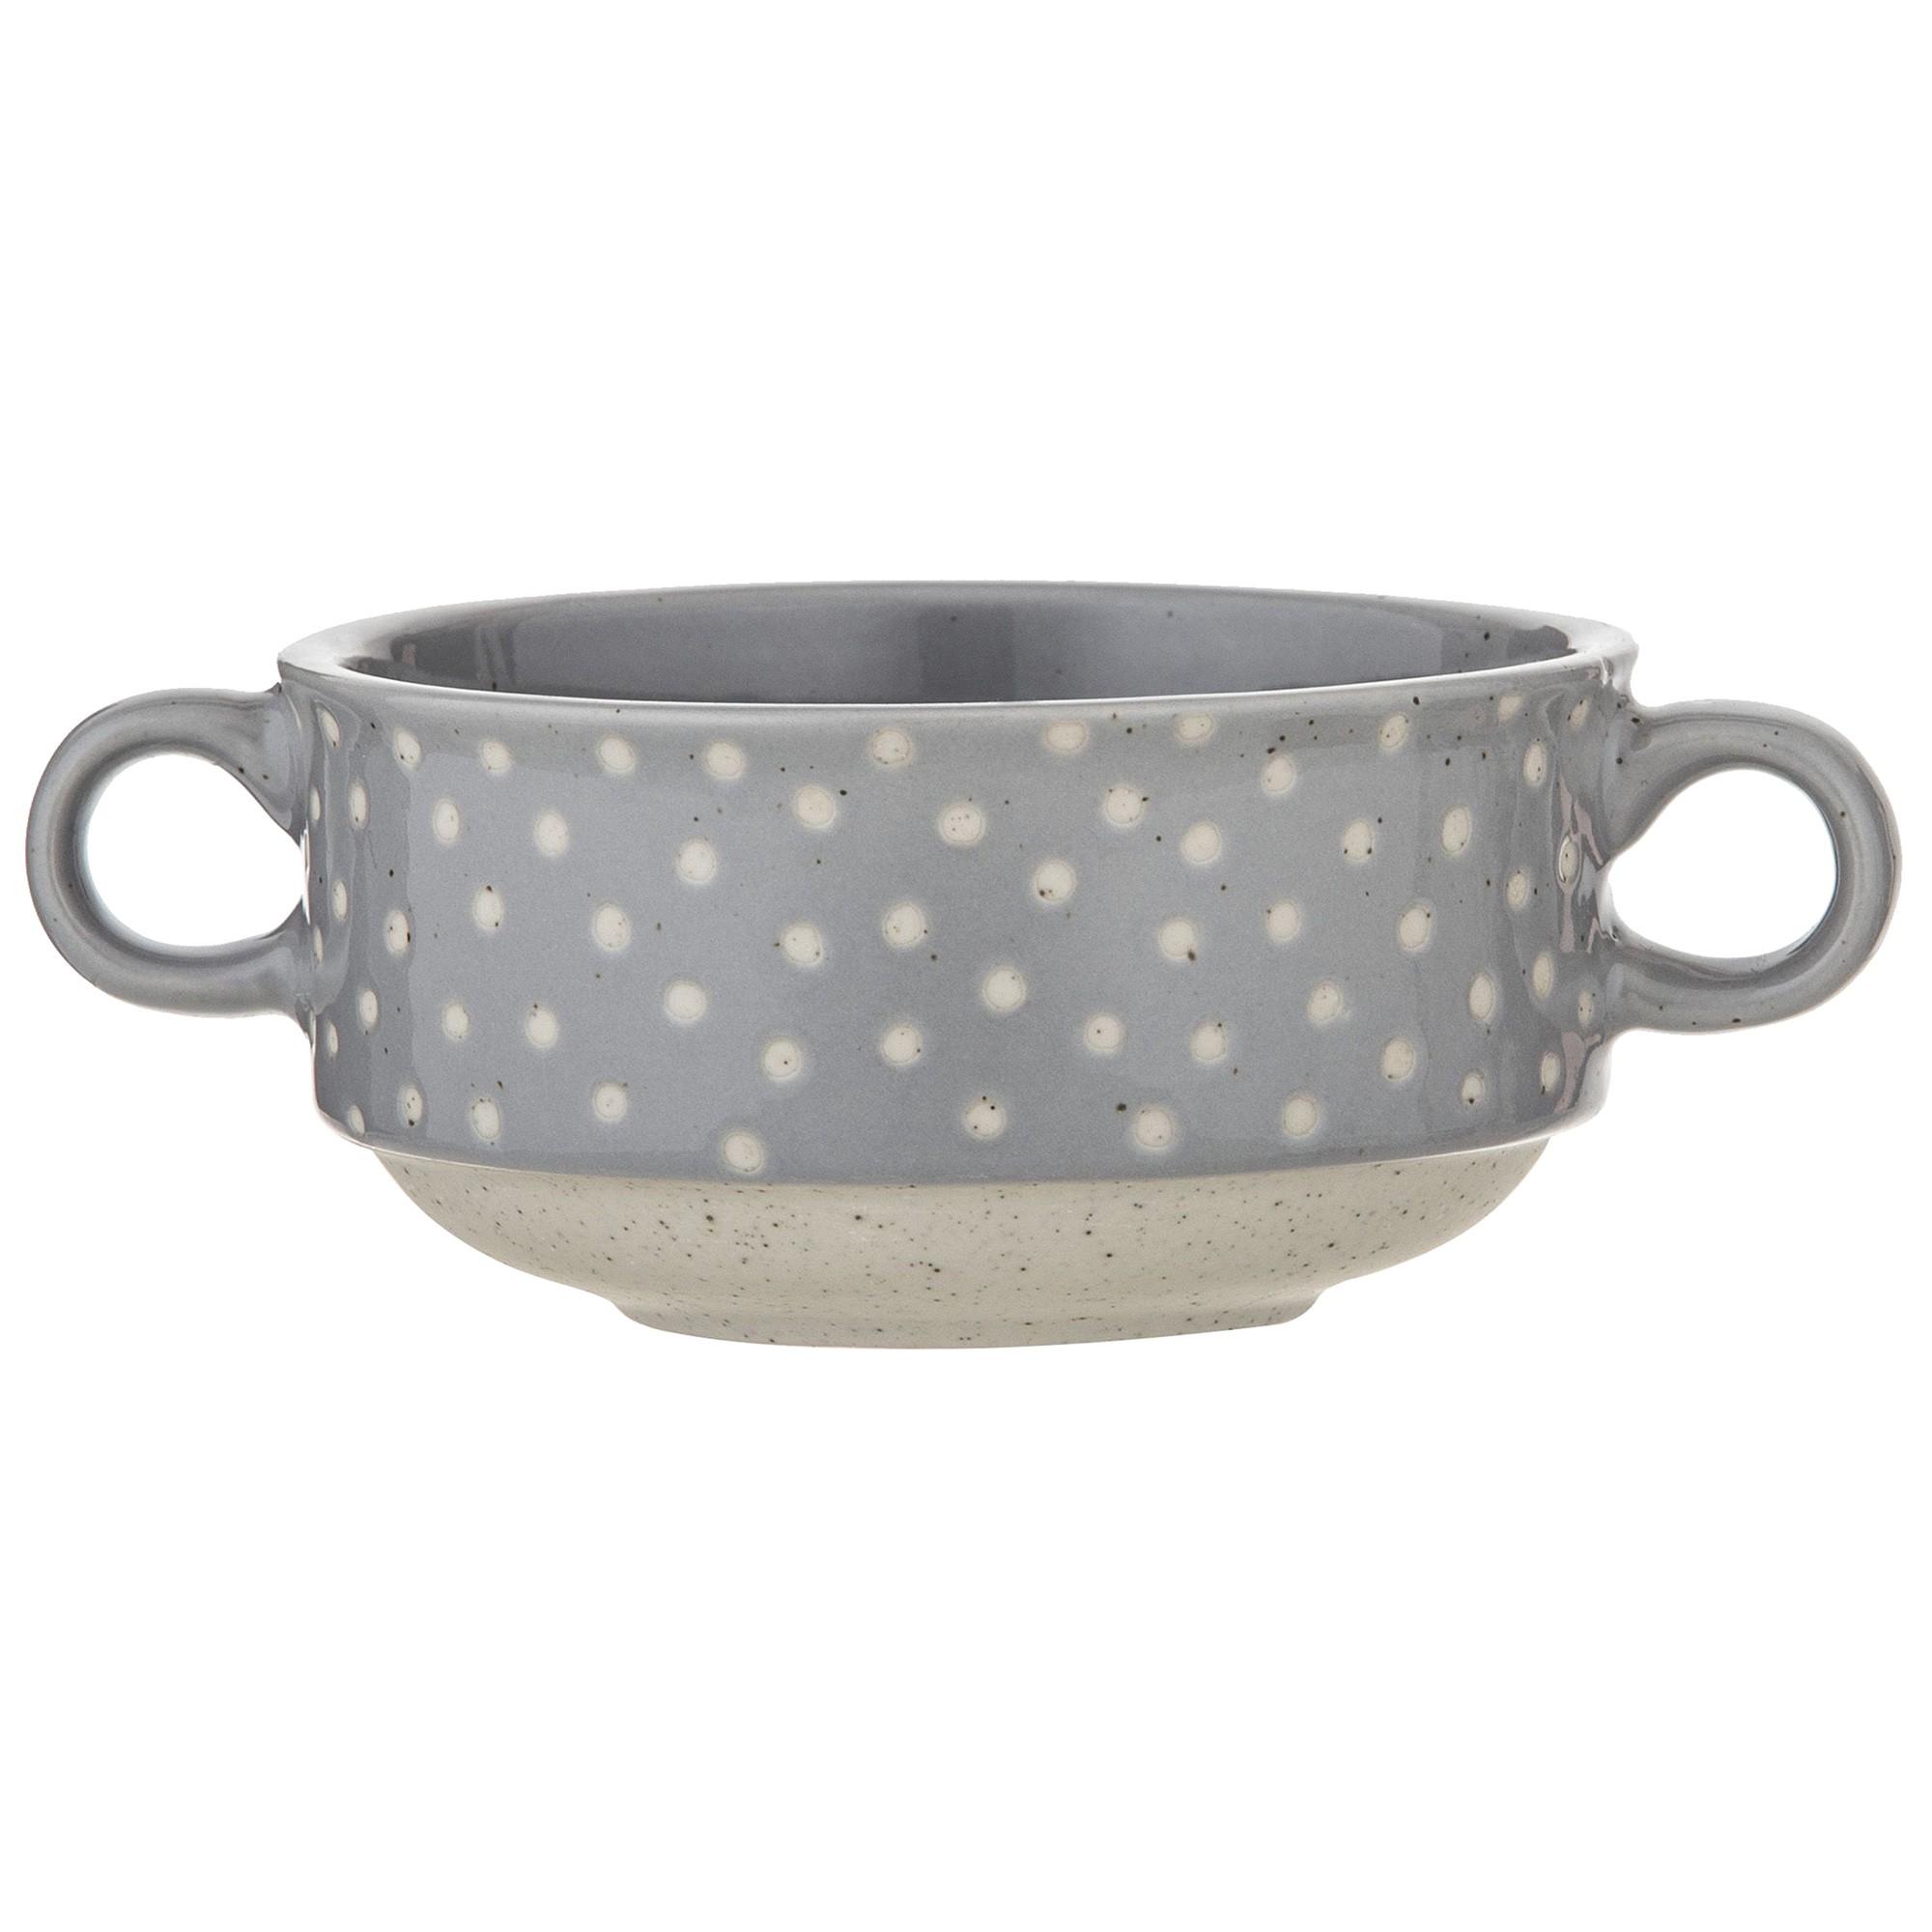 Kitson Ceramic Ramekin, Grey